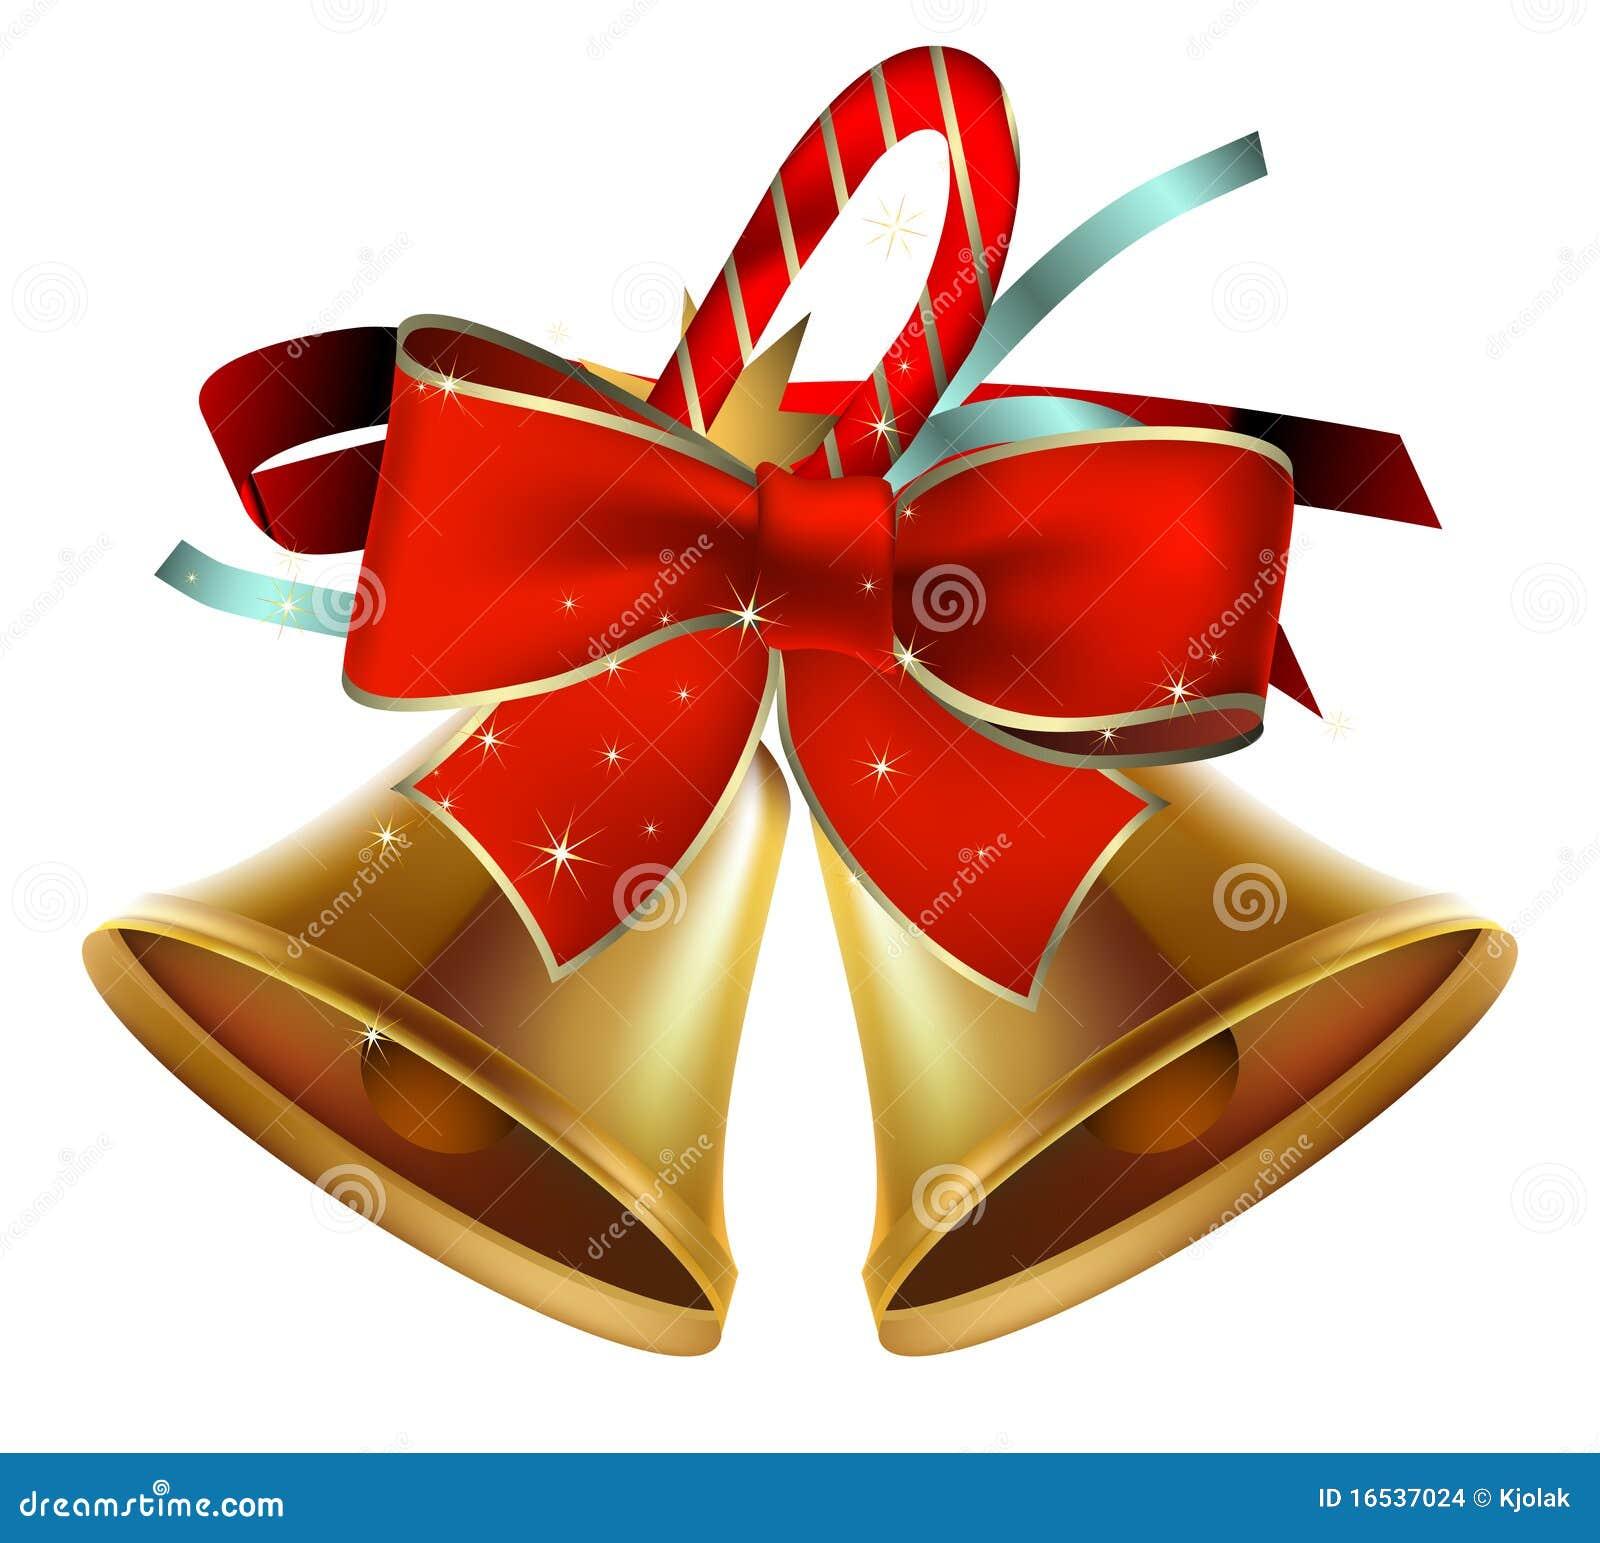 christmas bells stock vector image of ribbon bell. Black Bedroom Furniture Sets. Home Design Ideas